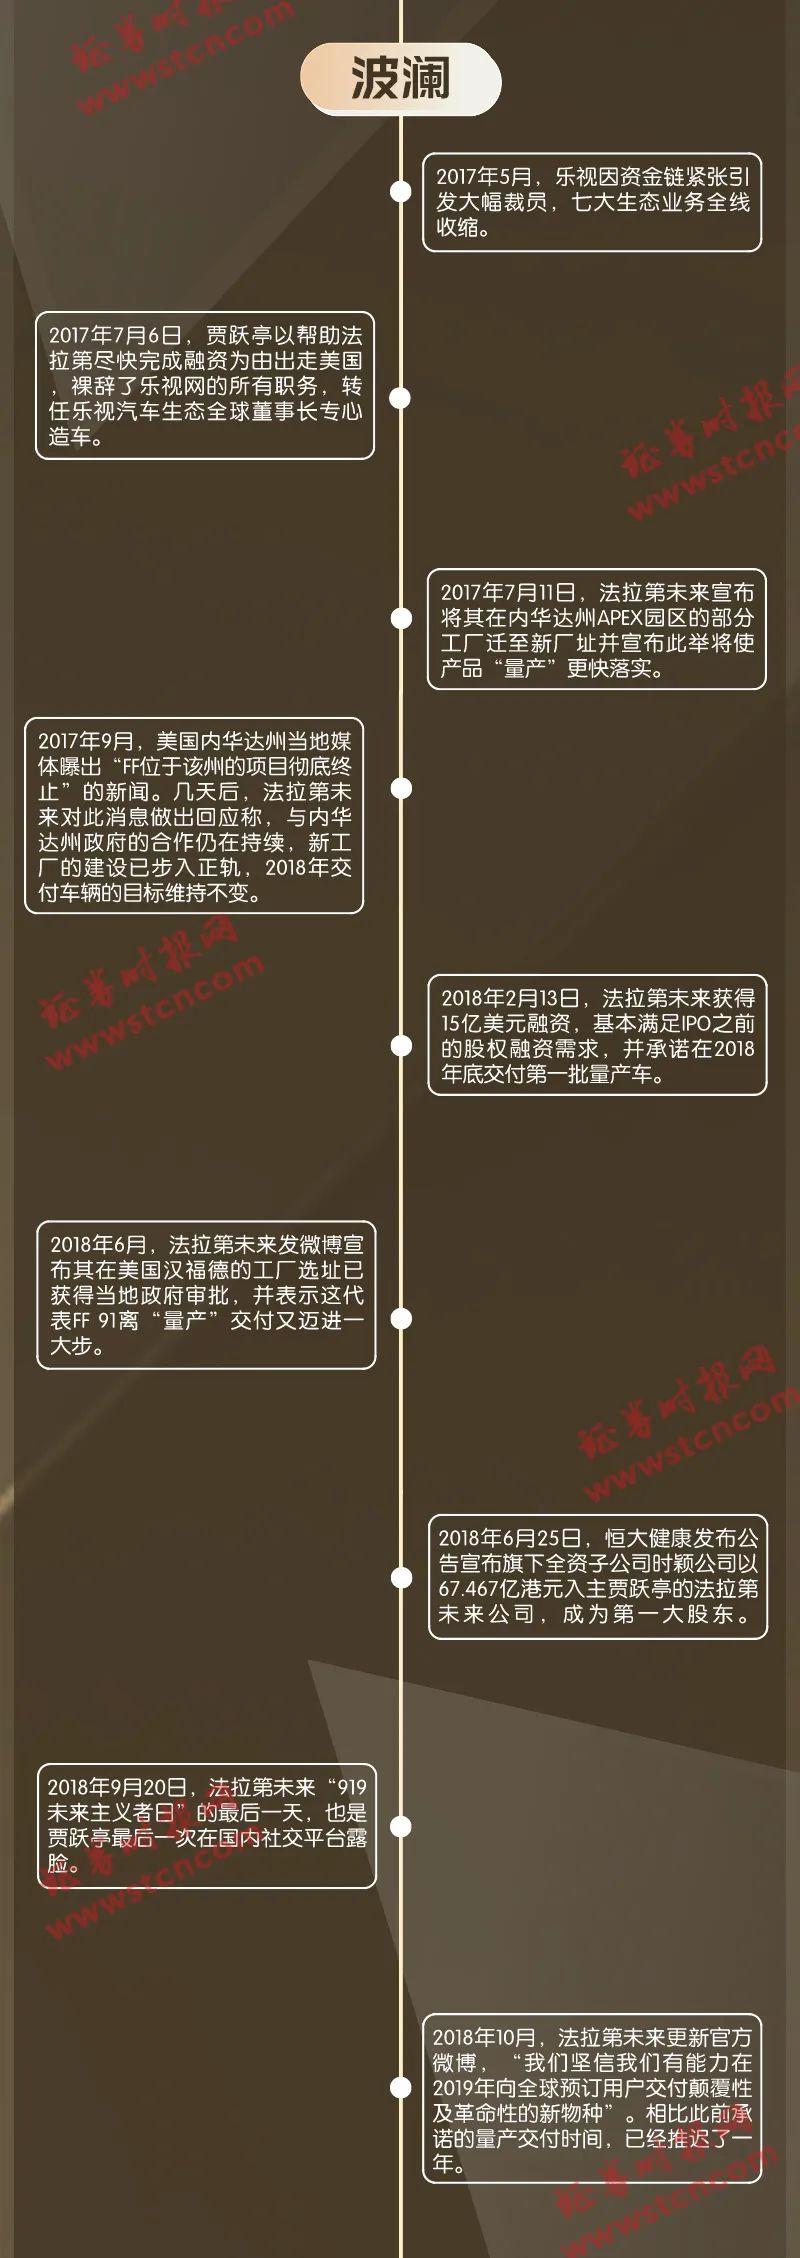 "FF拟纳斯达克上市,一图复盘贾跃亭""造车梦""怎延续!"